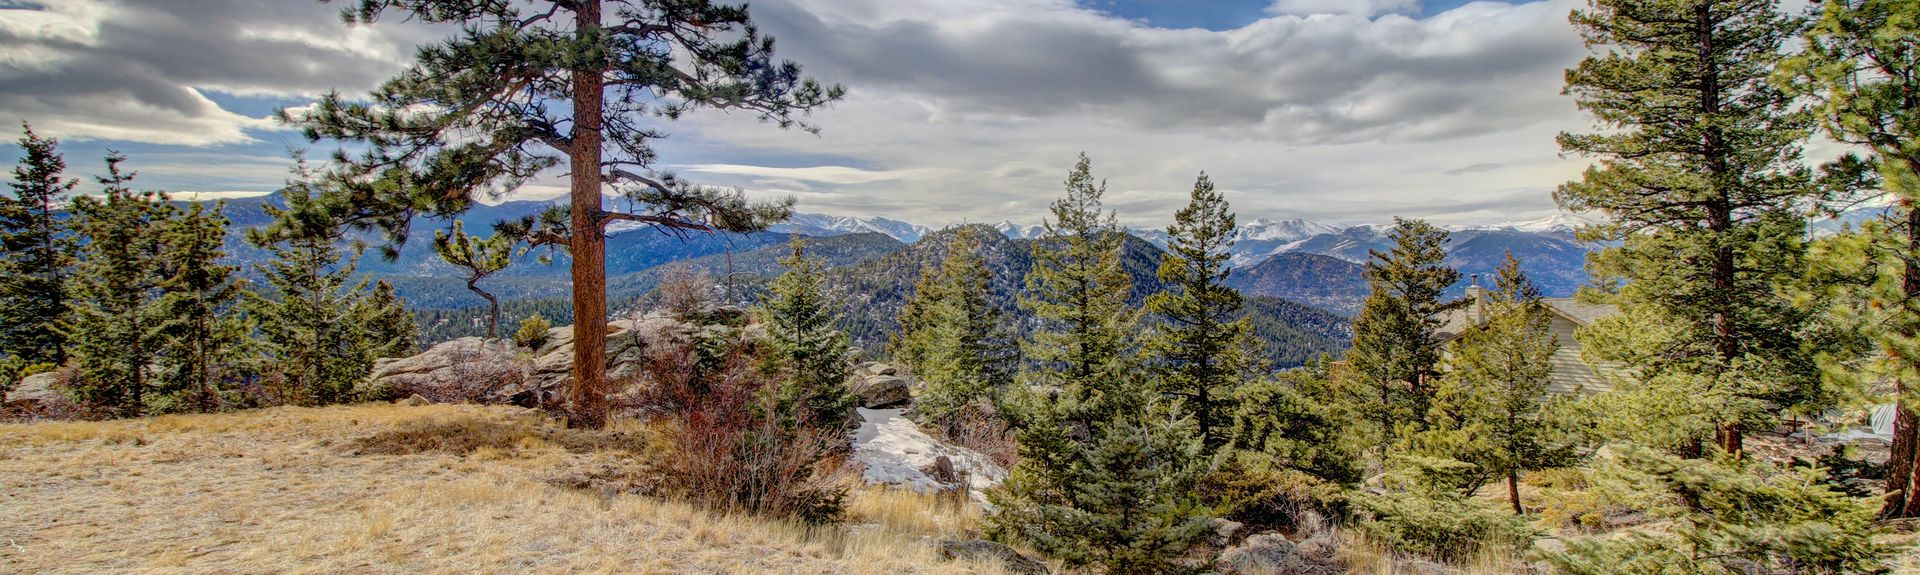 Deer Mountain, Estes Park, Colorado, United States of America